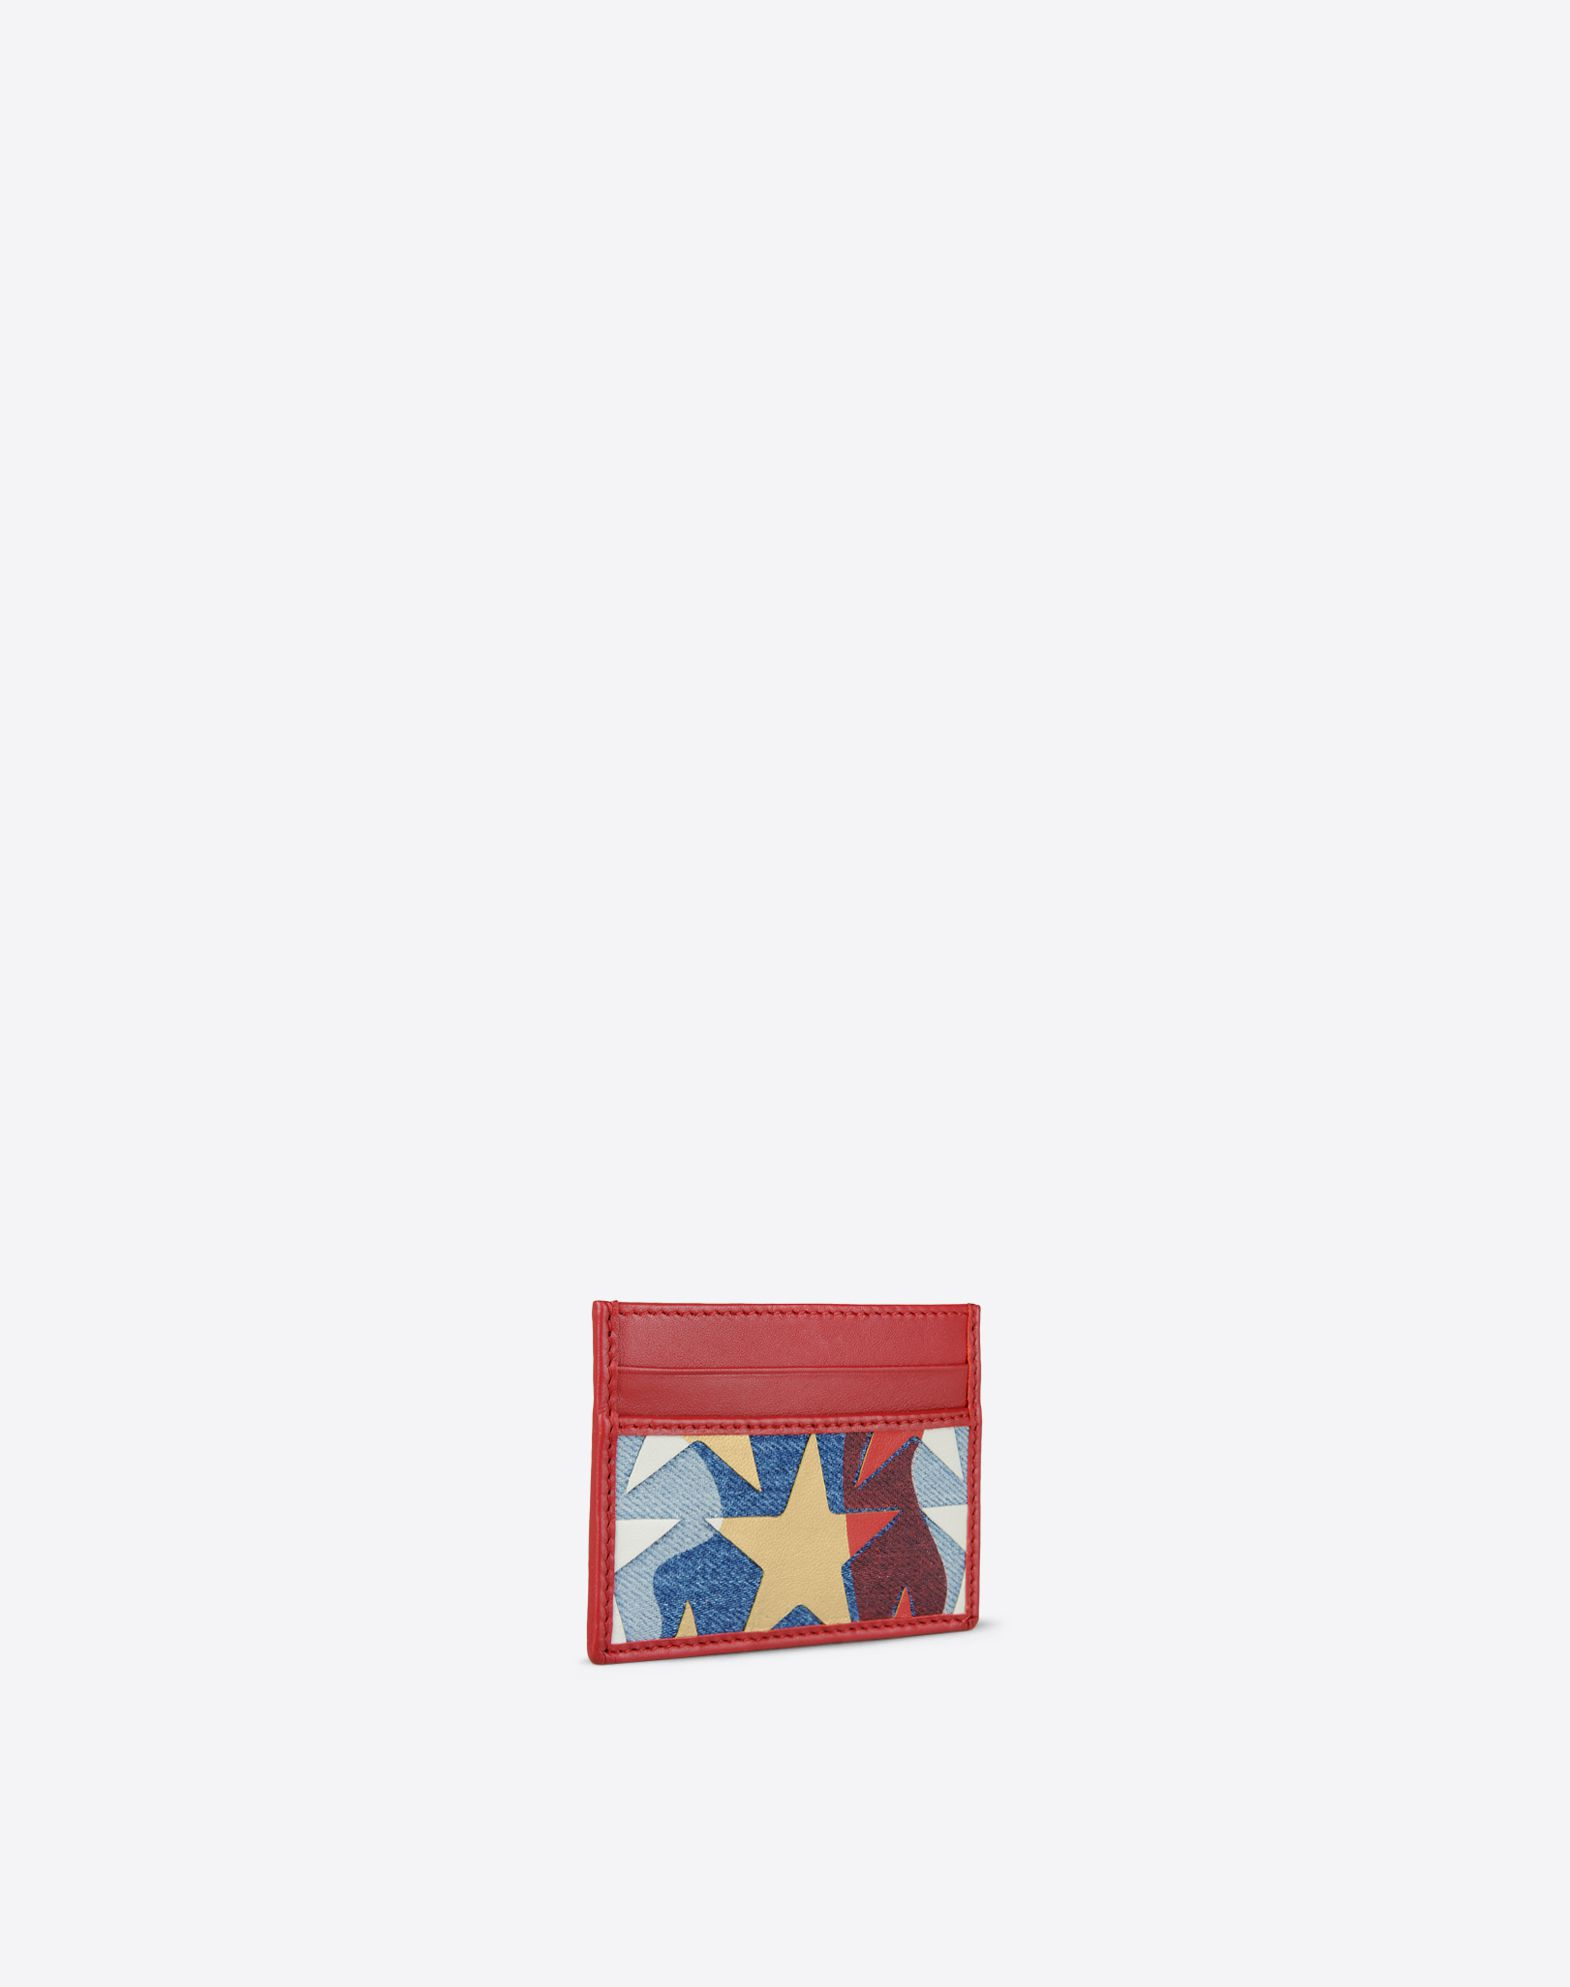 VALENTINO GARAVANI UOMO LY2P0448GAD 368 CARD CASE U r